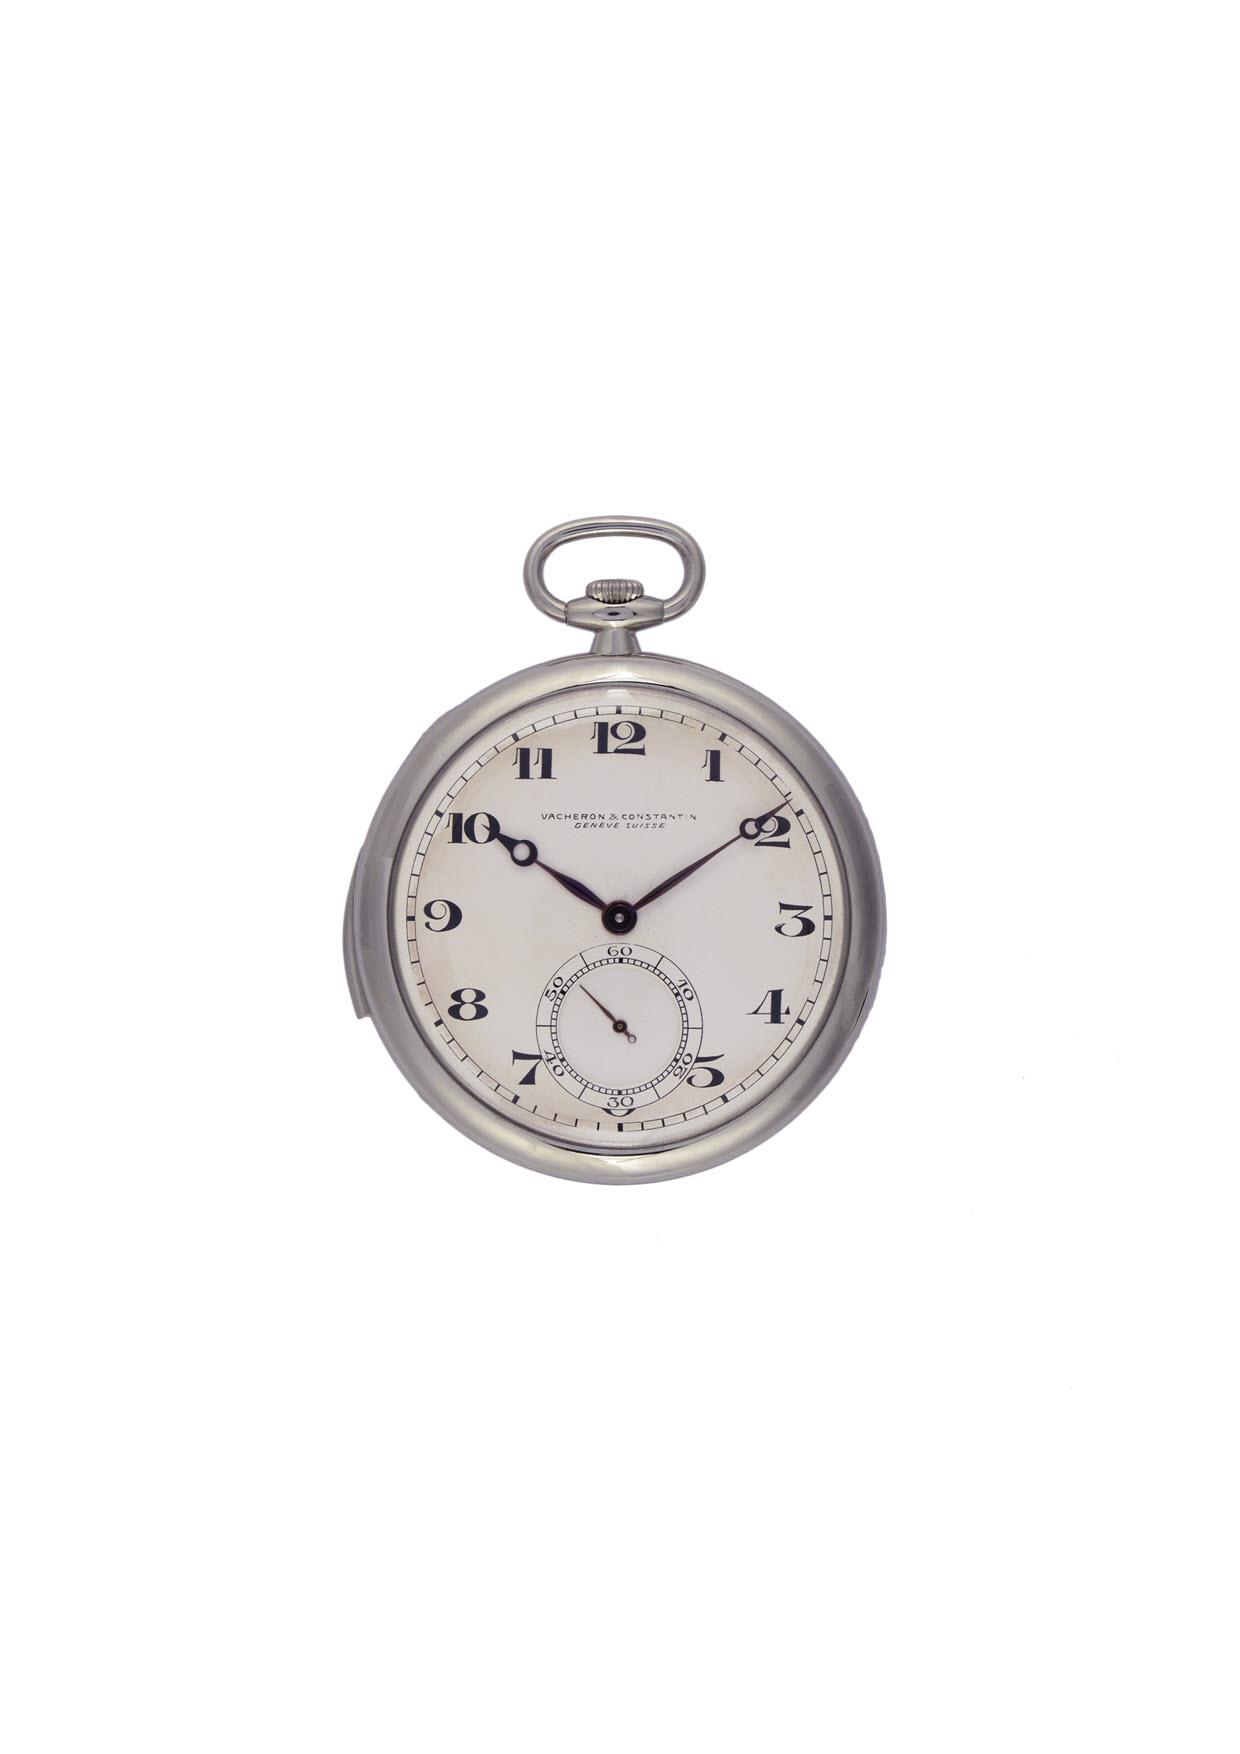 Vacheron Constantin Platinum ultra-thin minute-repeater pocket watch, circa 1928.